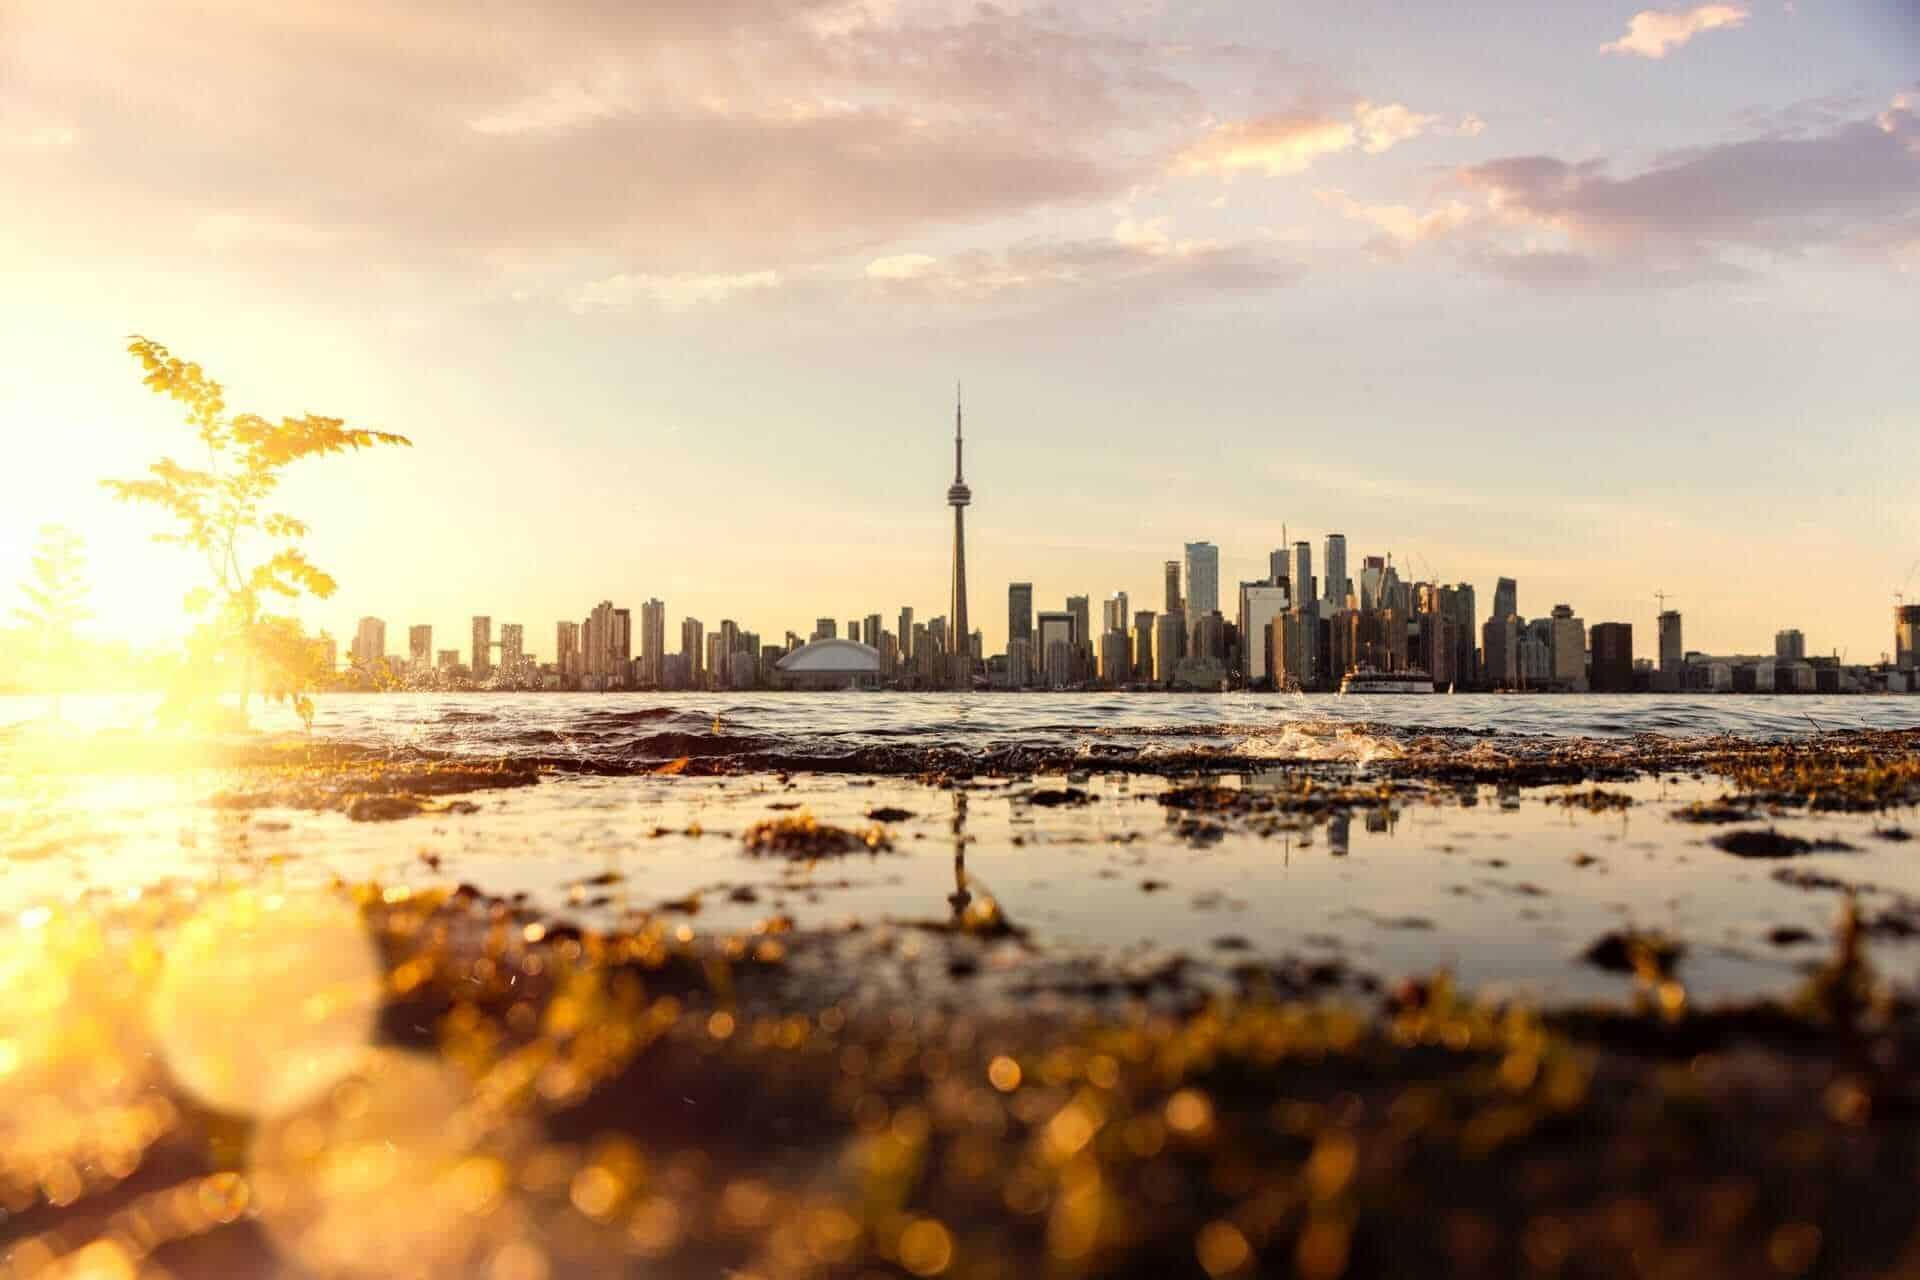 Islands, Toronto, Canada